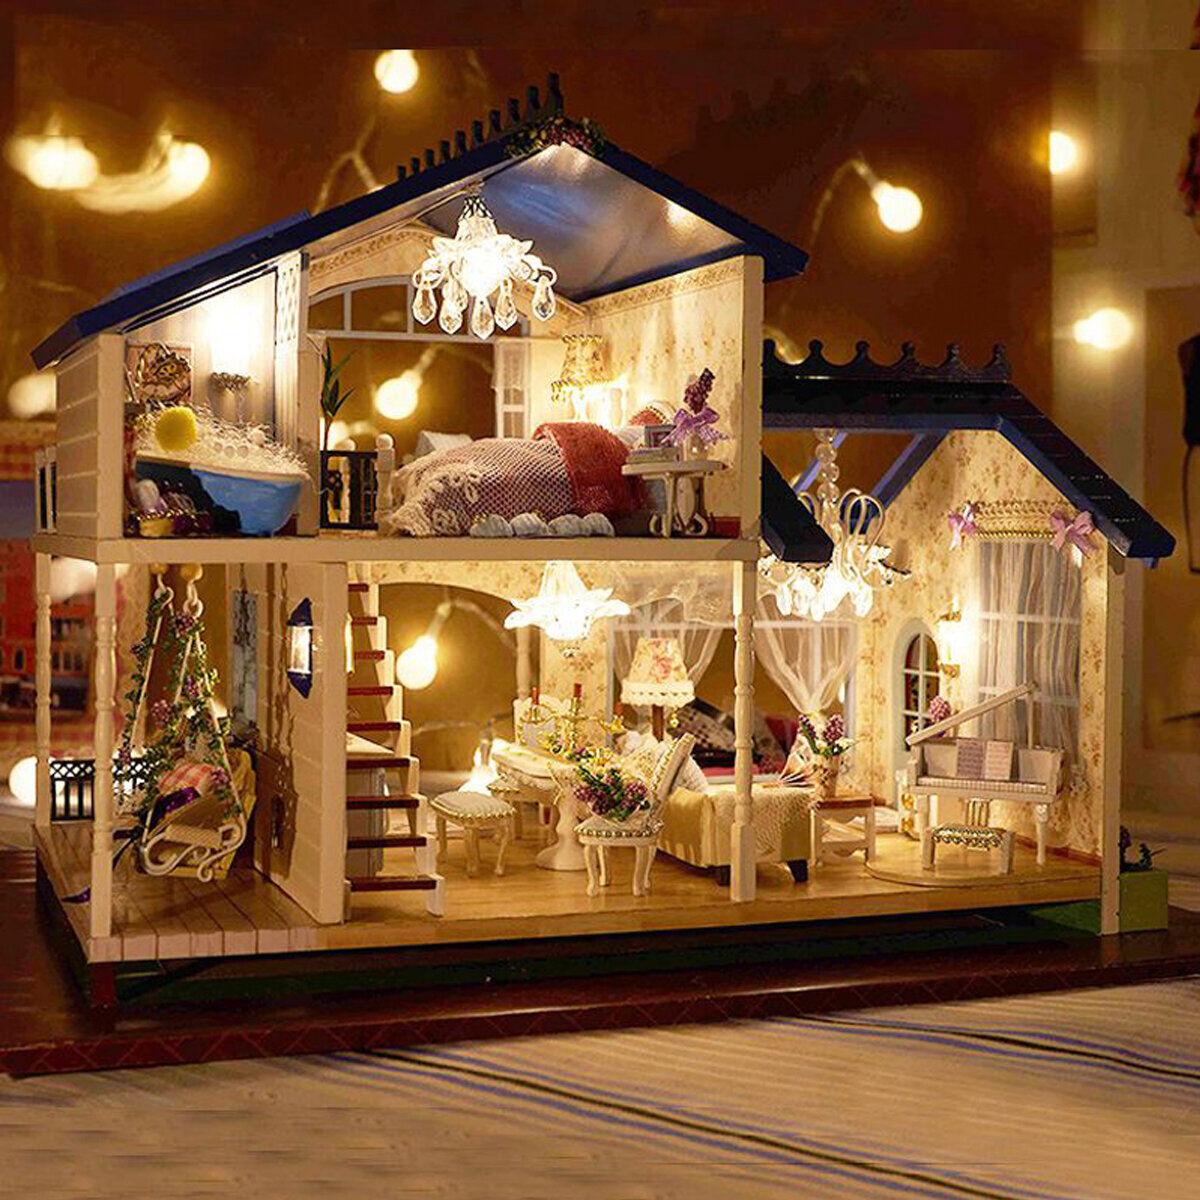 Newchic DIY Toy House